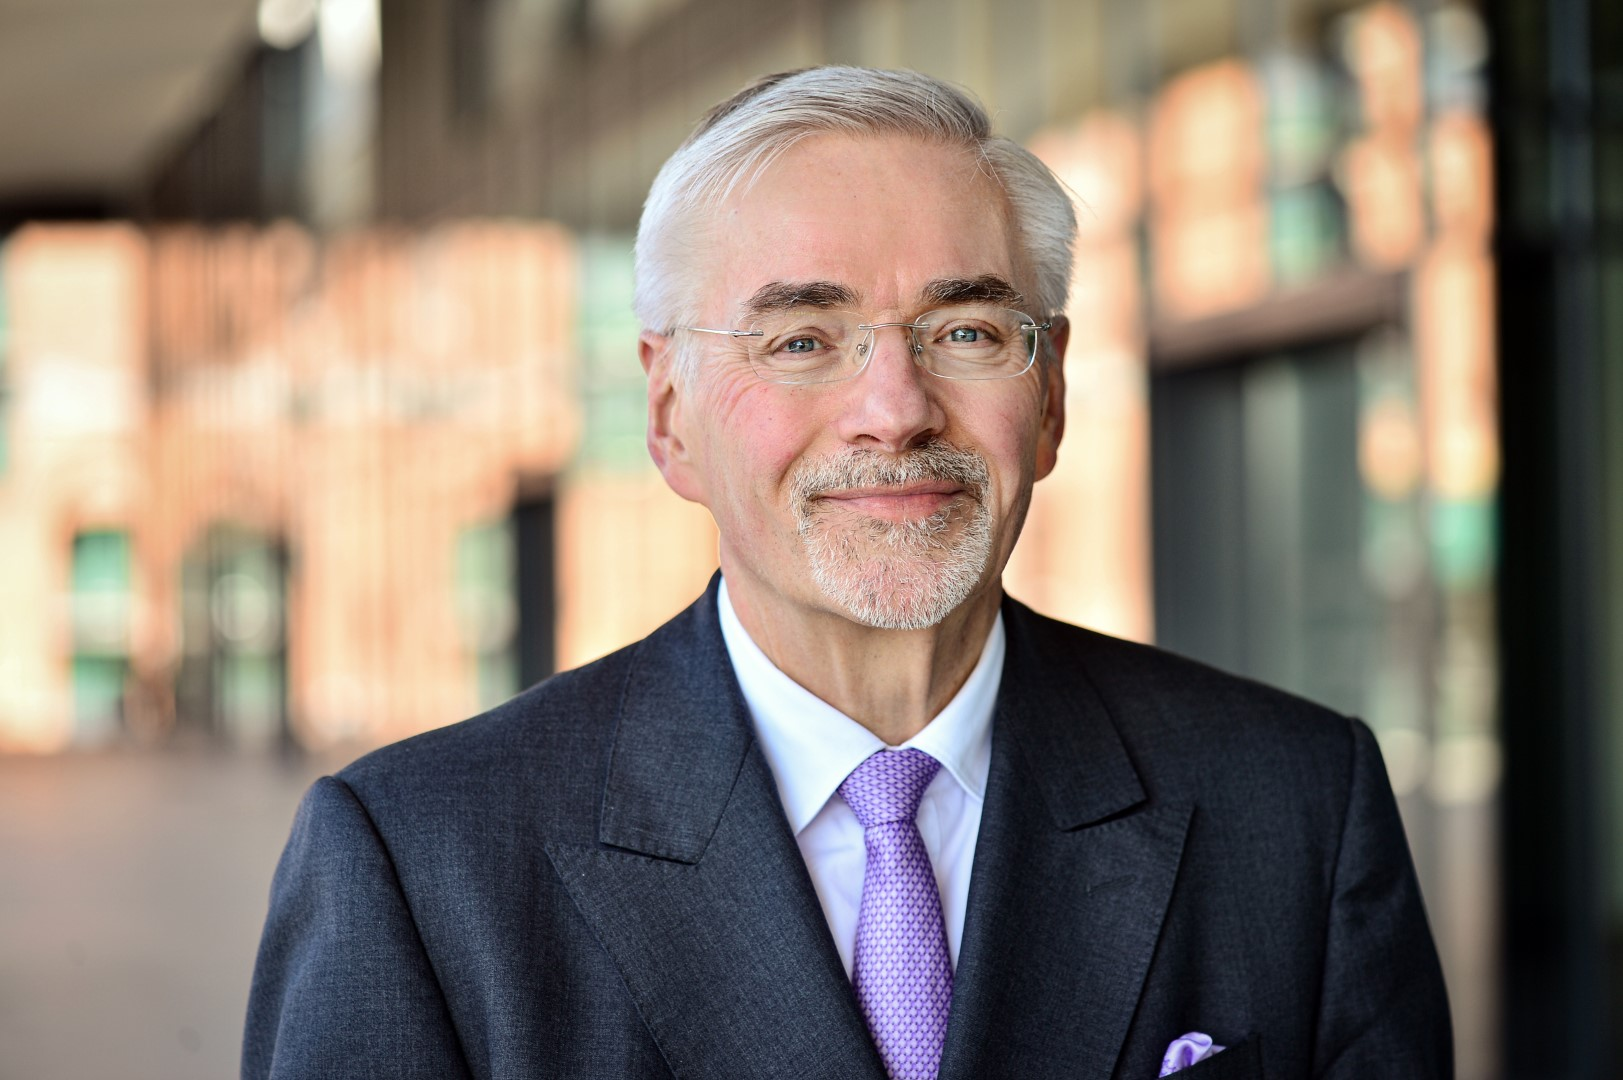 Prof. Bruns-Berentelg Portraitfoto